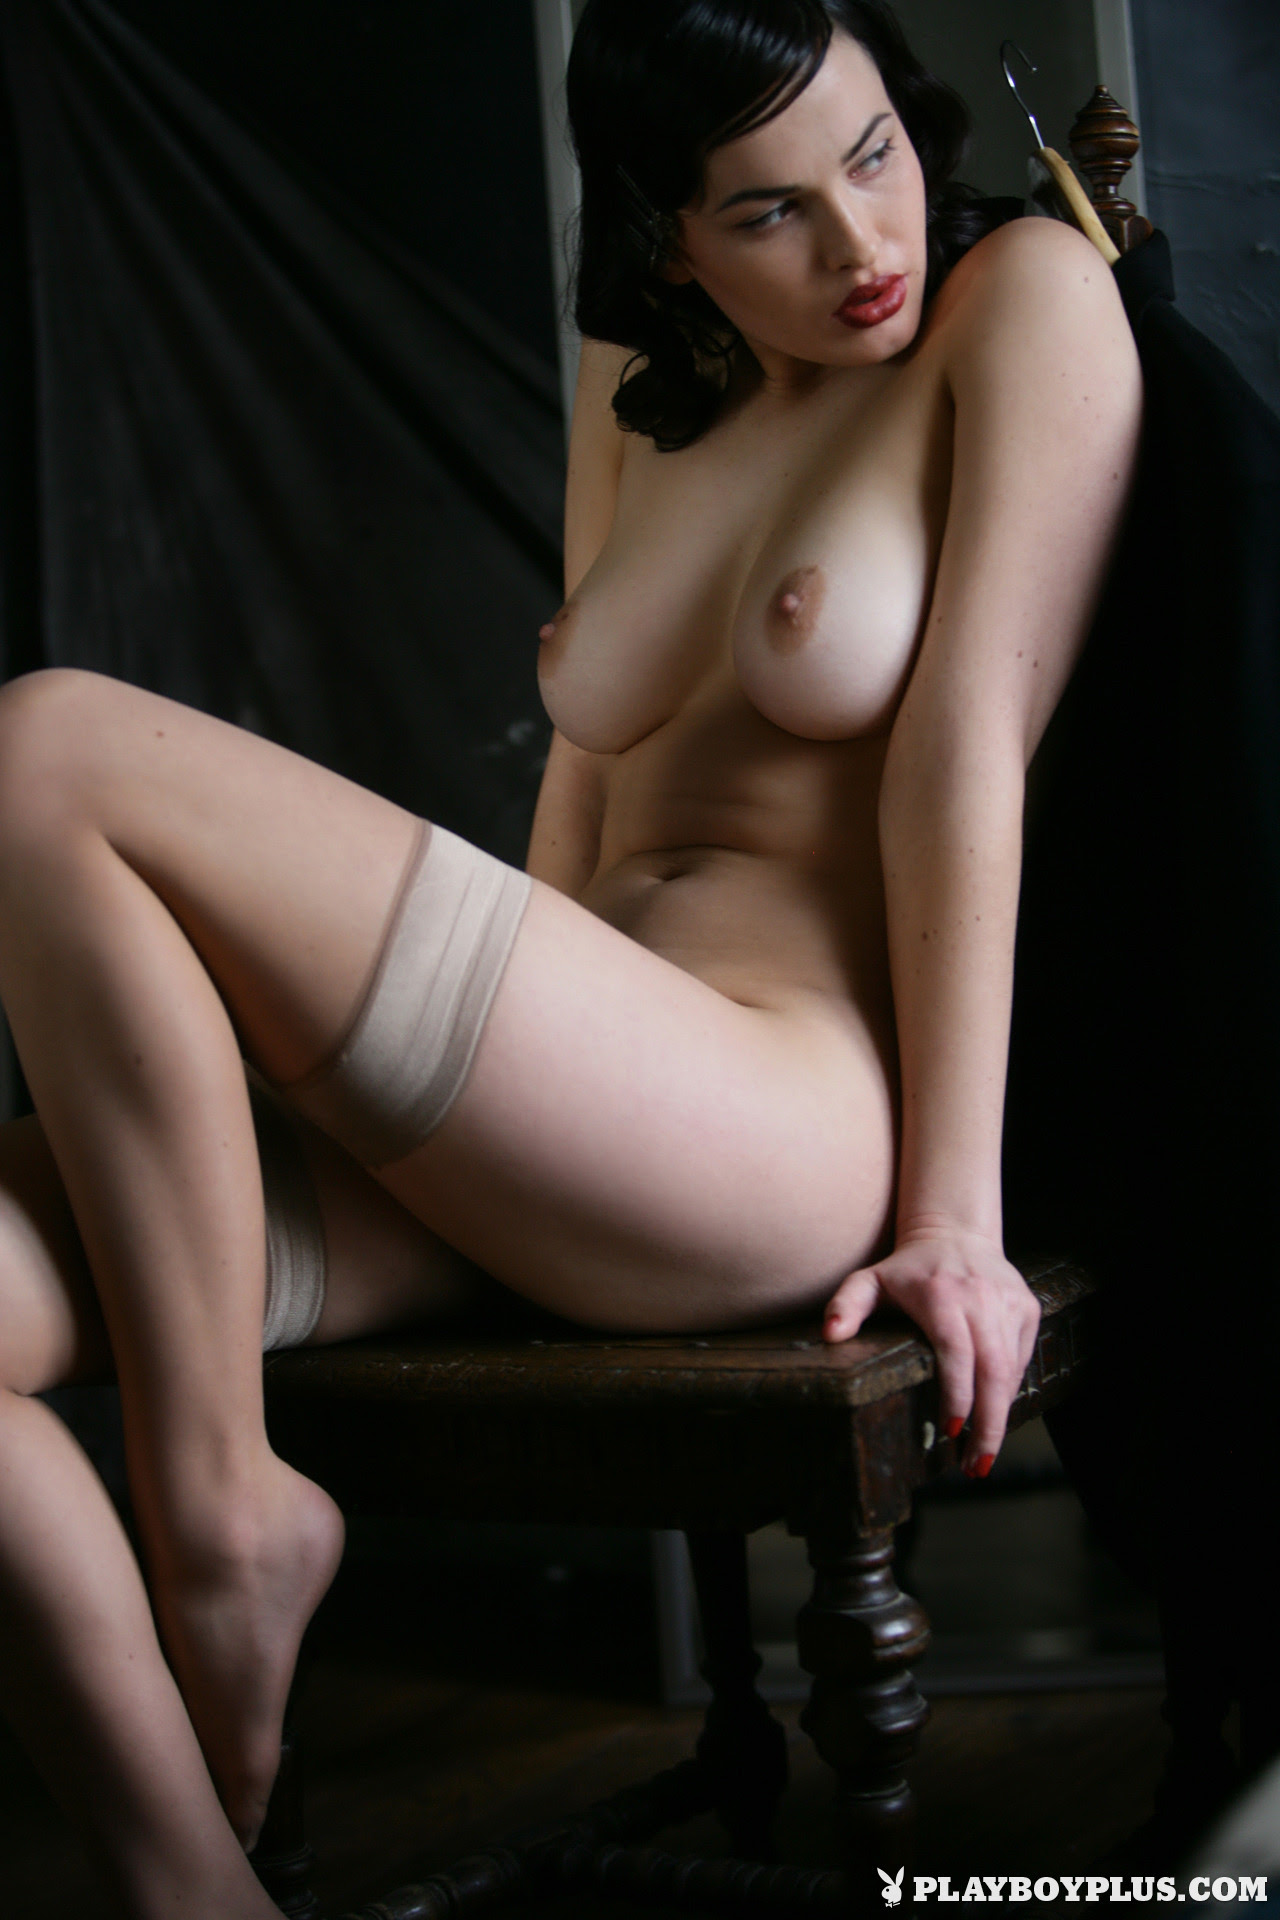 Dasha Astafieva de Playboy Plus